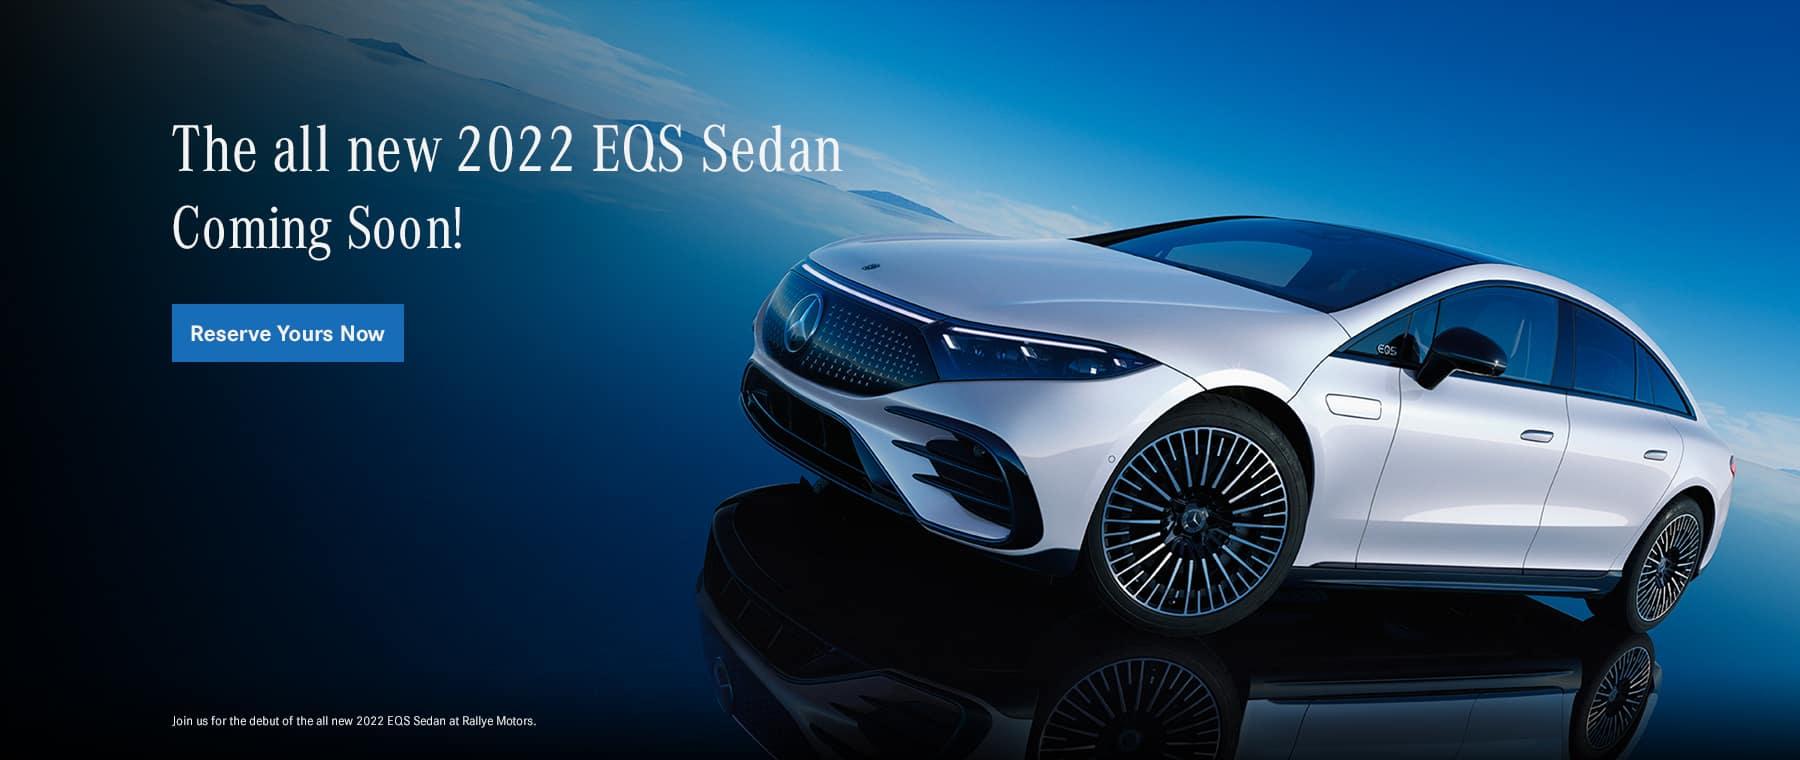 The all new 2022 EQS Sedan coming soon to Rallye Motors